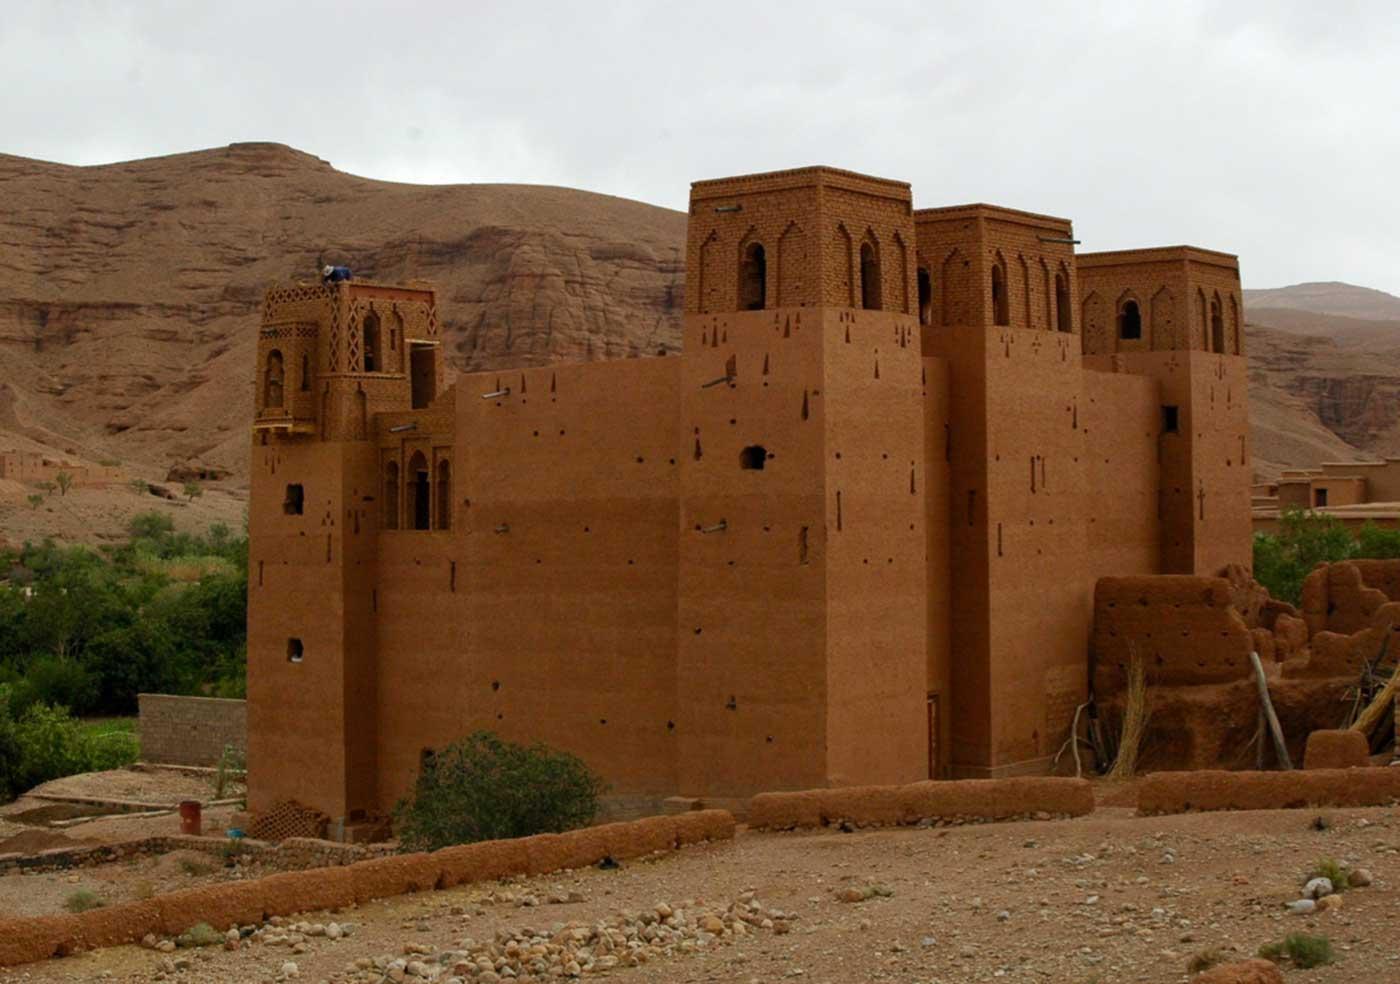 Sur de Marruecos en bicicleta (8 días)